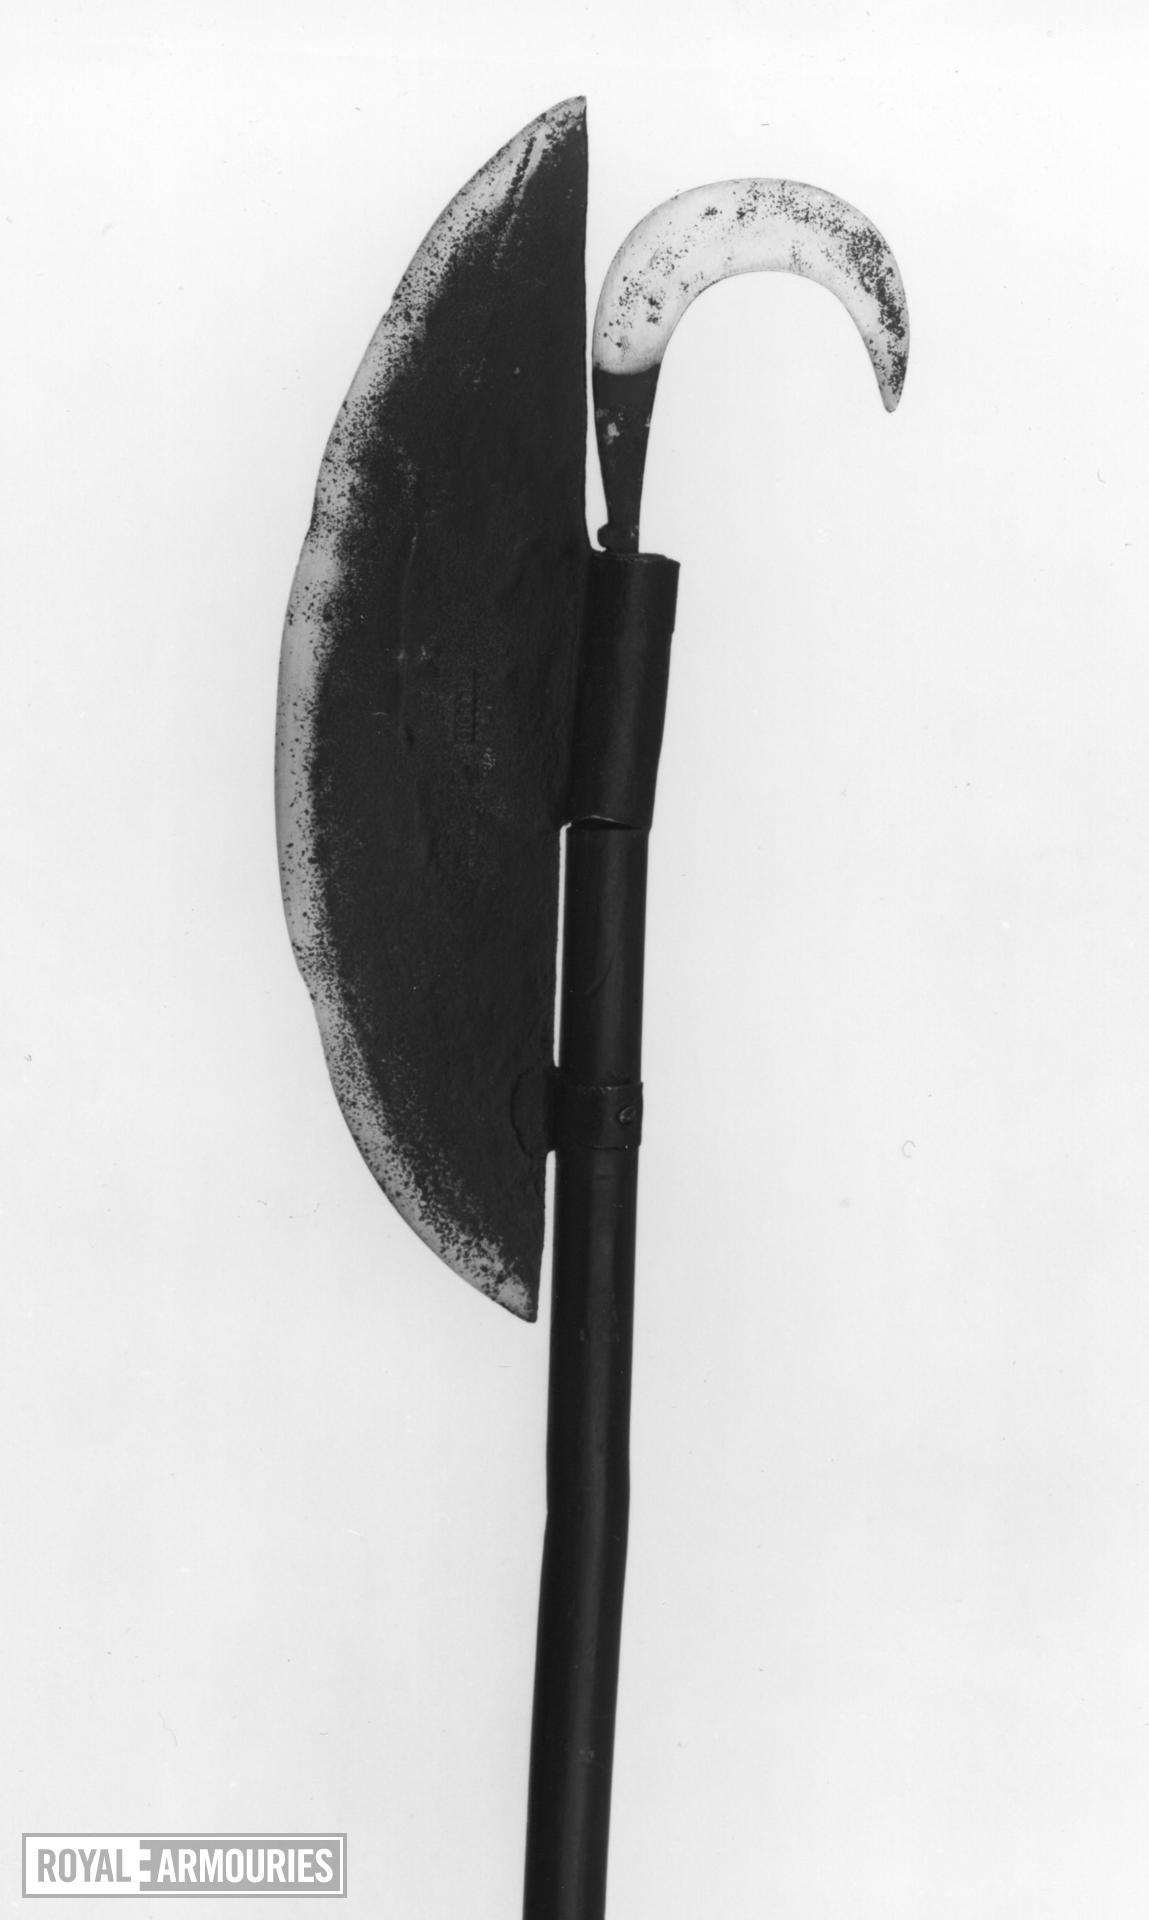 Lochaber axe